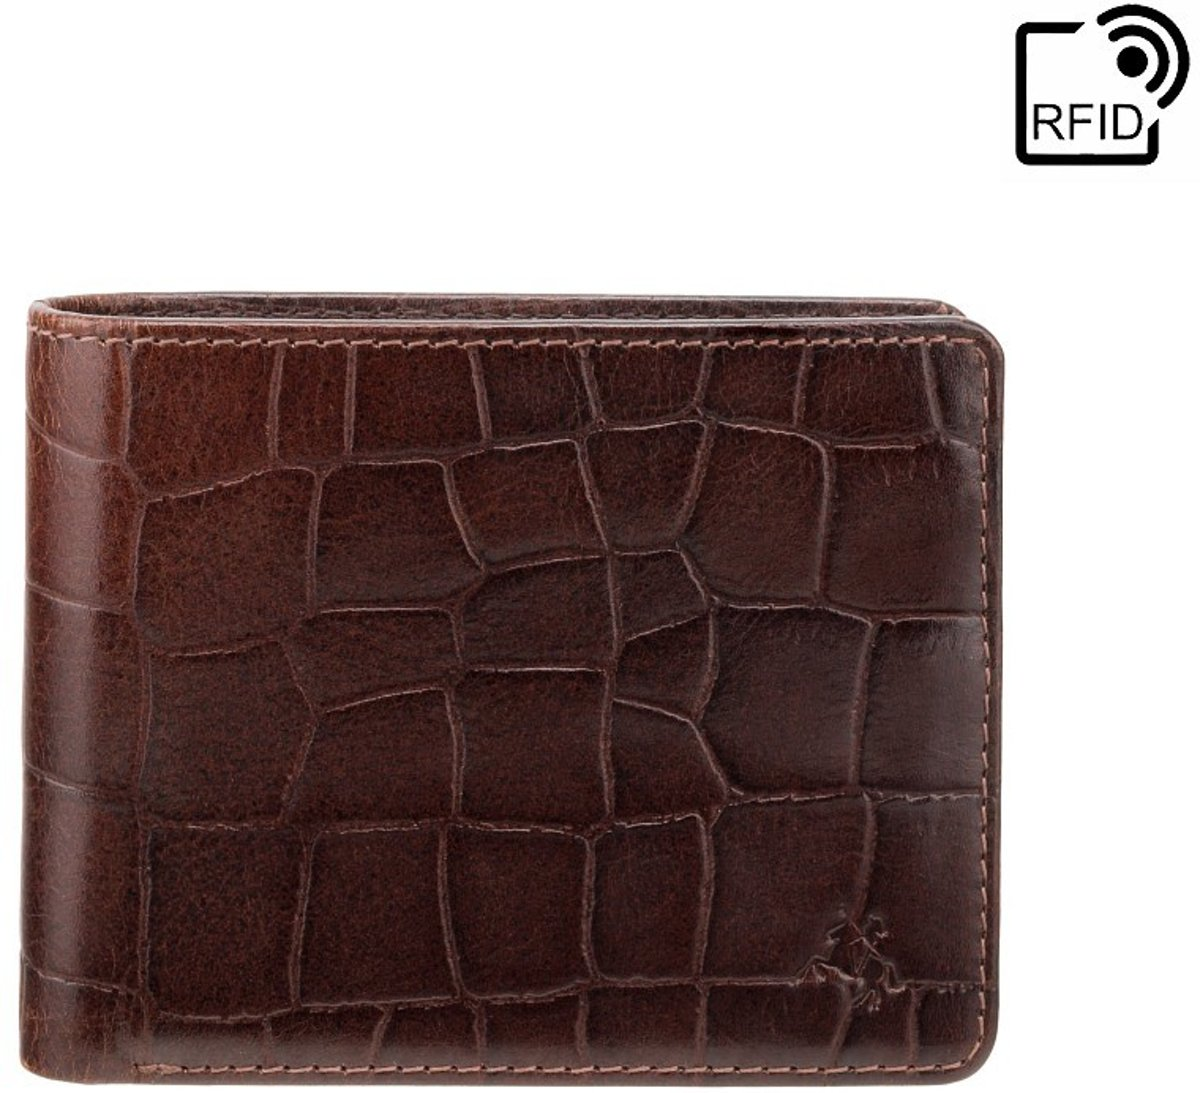 Visconti Leren Portemonnee Mannen Billfold Portemonnee RFID Leer 4 pasjes Croco Collectie Bruin (CR92 BN)